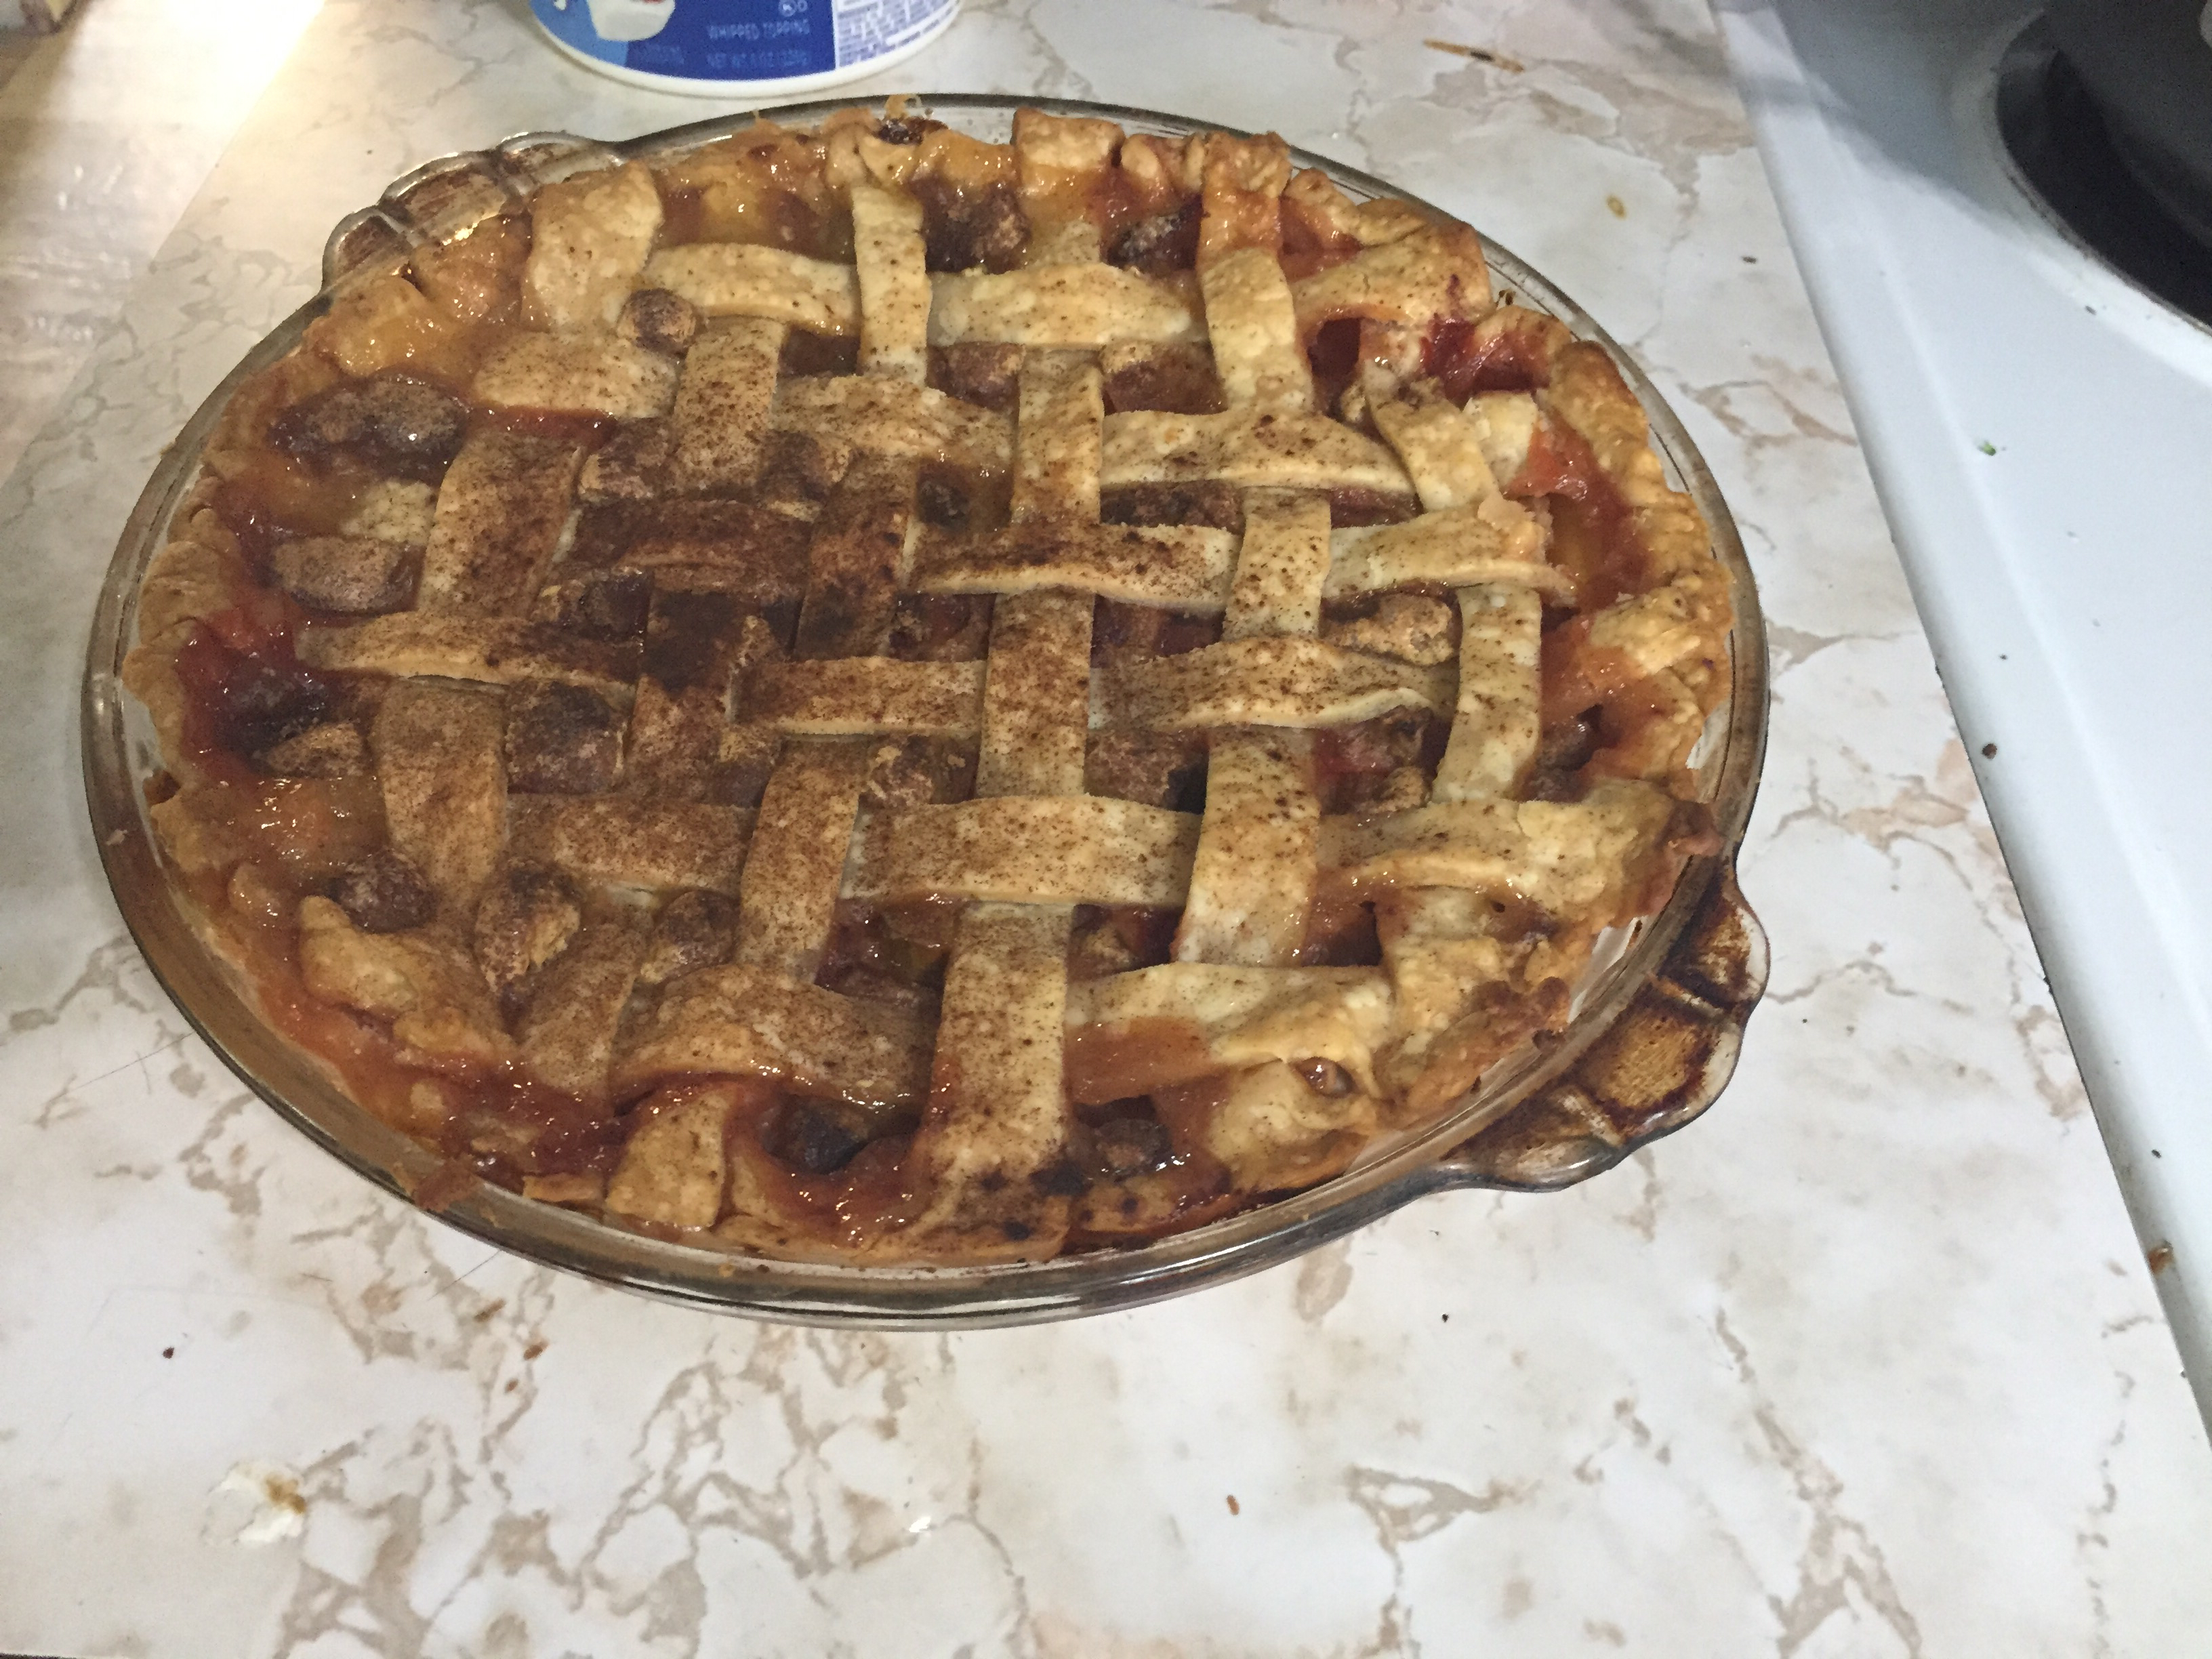 Grammy's Favorite Rhubarb Custard Pie Gloria